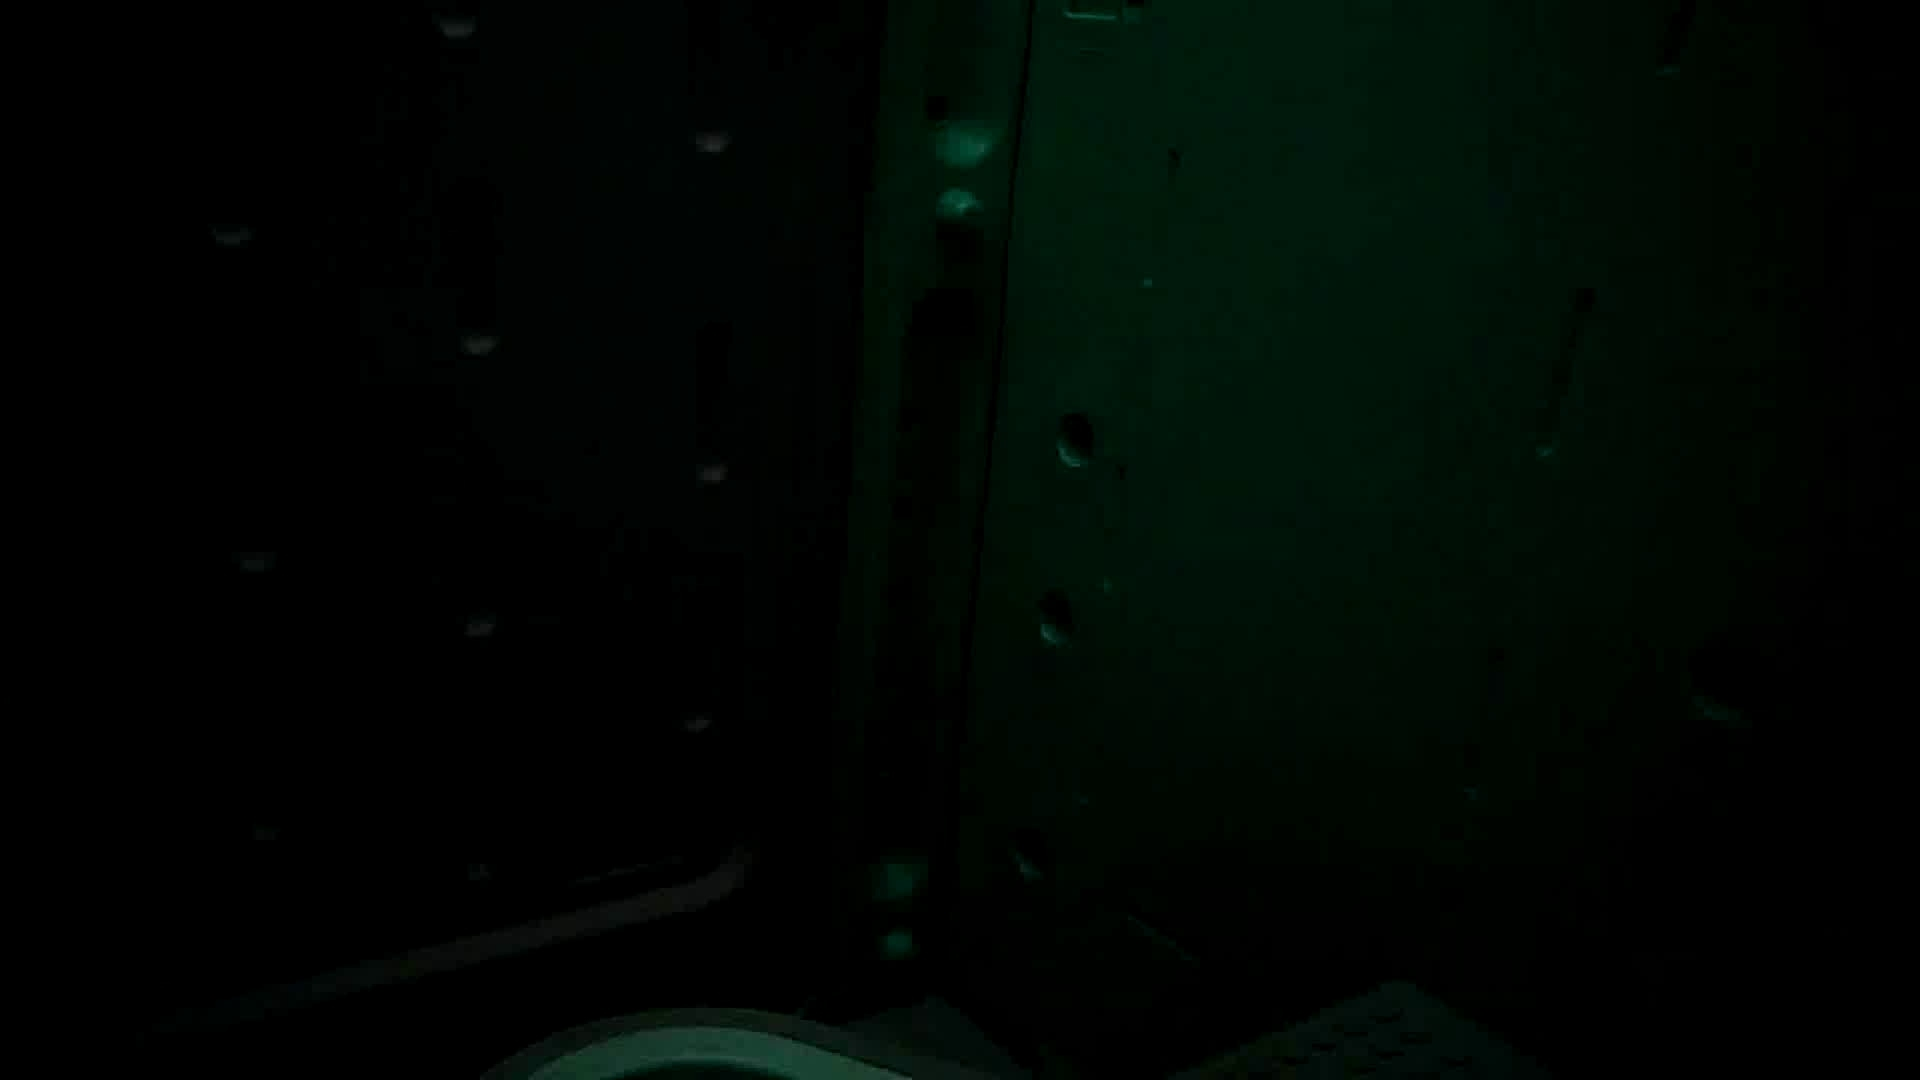 痴態洗面所 Vol.09 美女系、清楚系、ギャル系、時々祭り系?? 美女 戯れ無修正画像 90枚 65